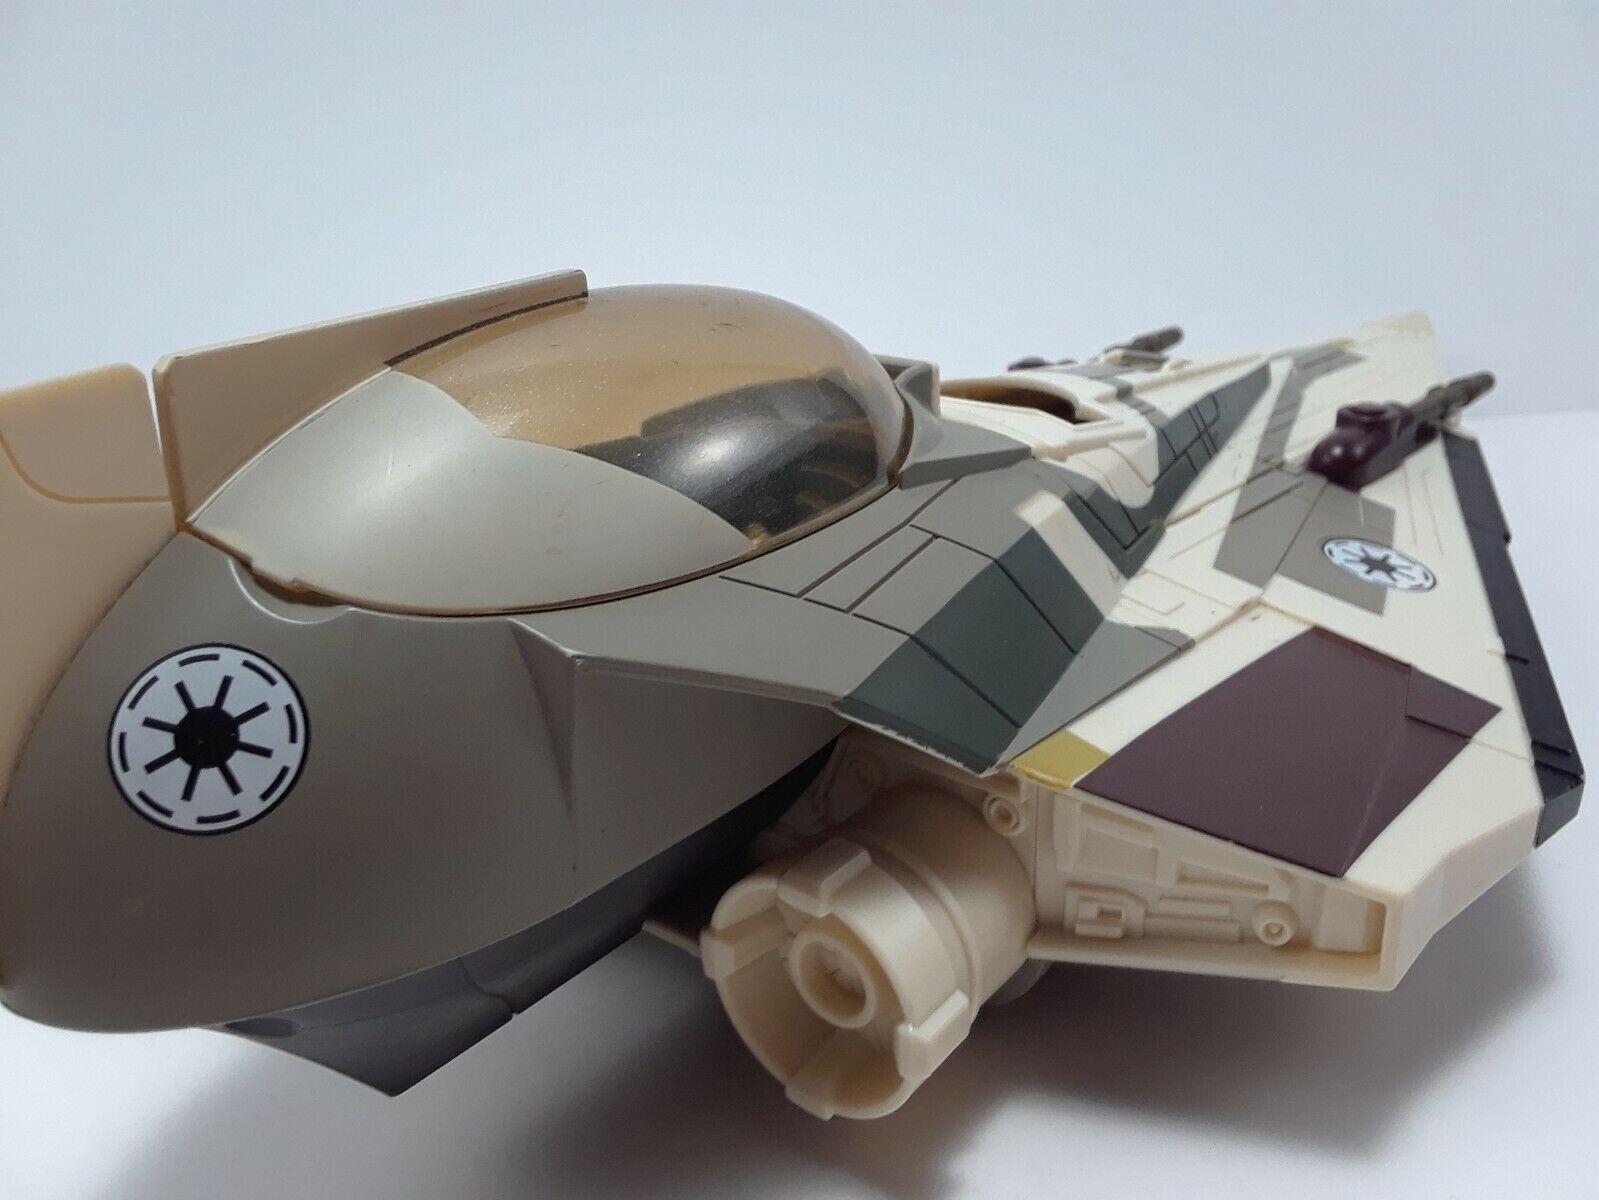 Star Wars The Clone Wars Mace Windu's Jedi Starfighter Hasbro Exclusive image 5